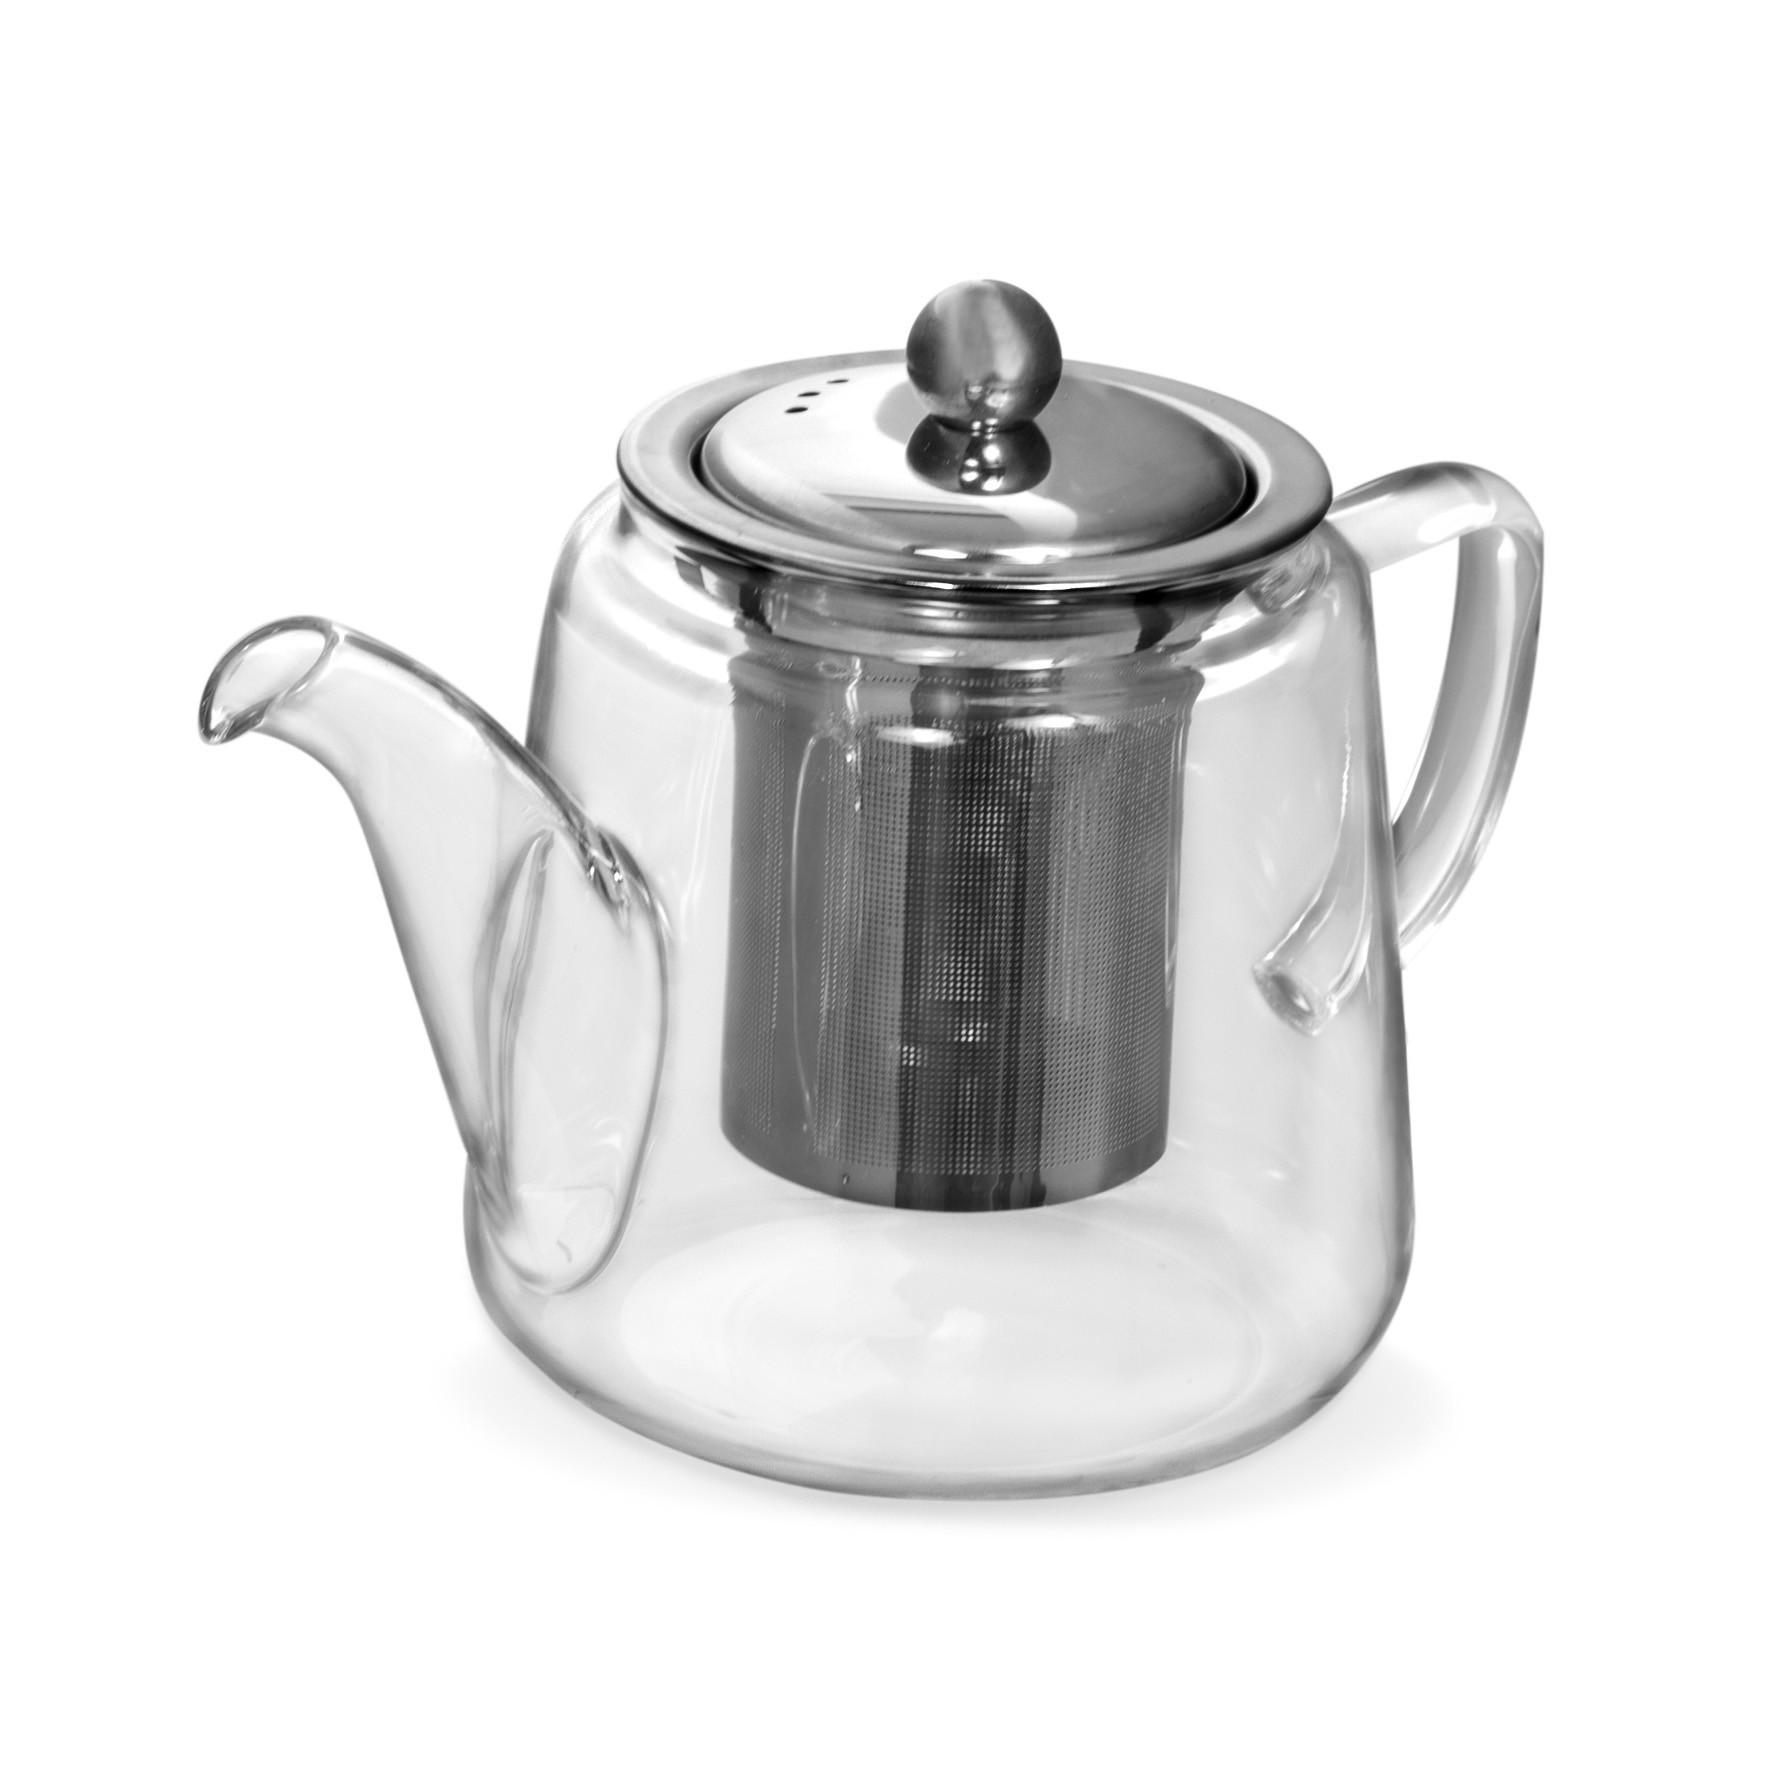 Bule de Chá Borossilicato com Infusor Inox